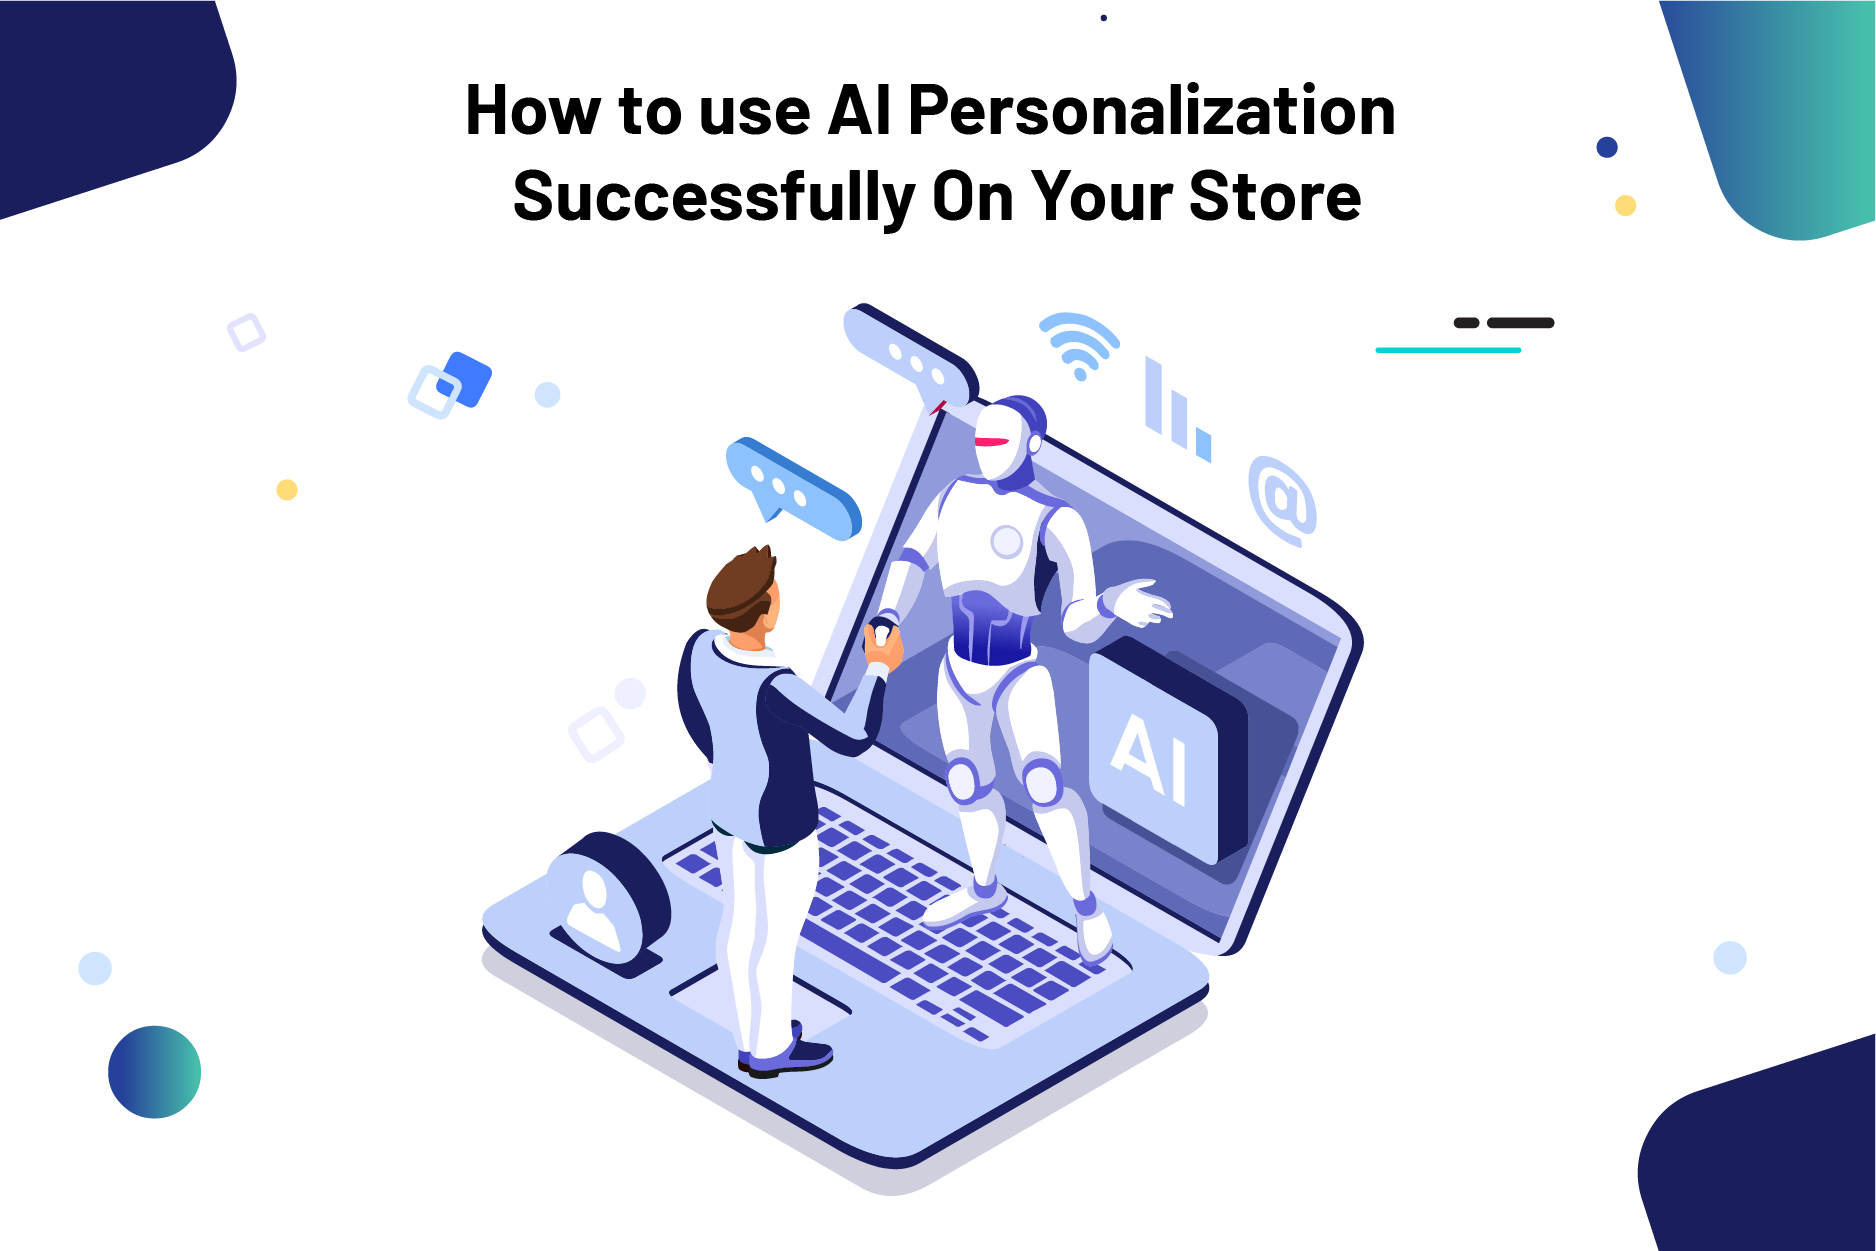 AI personalization